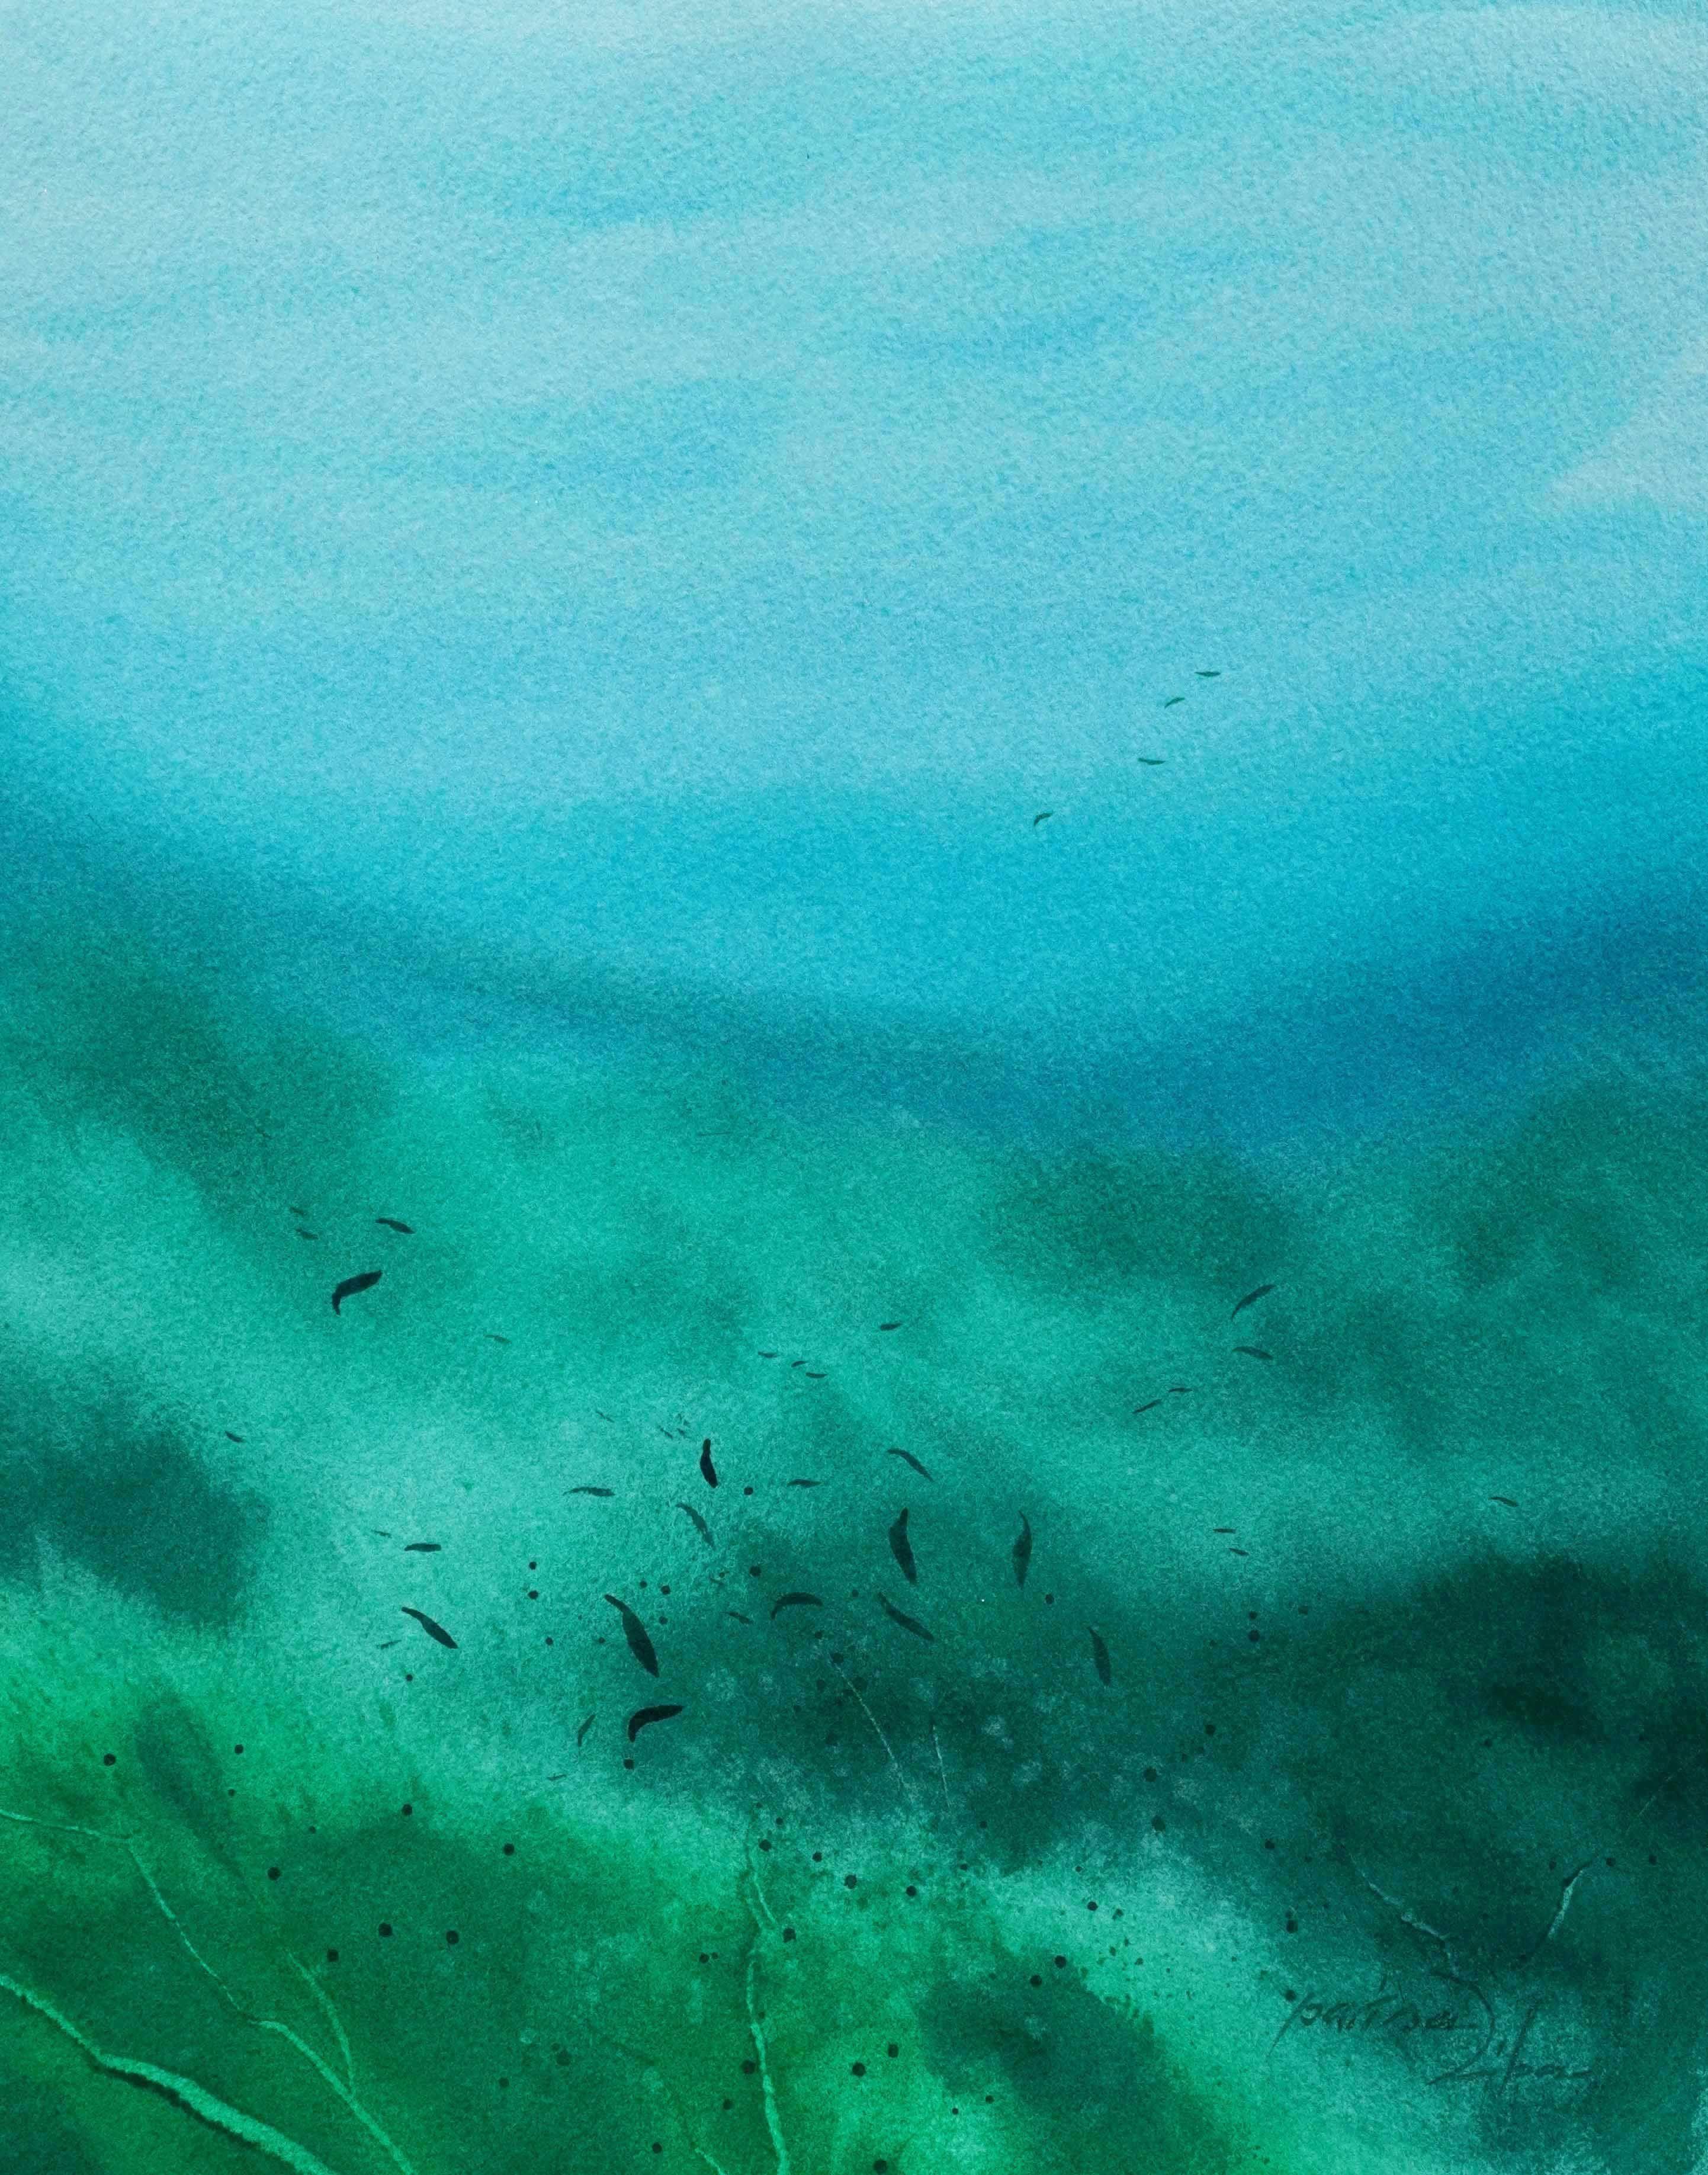 City Under Water 8x10 Original Watercolor Painting